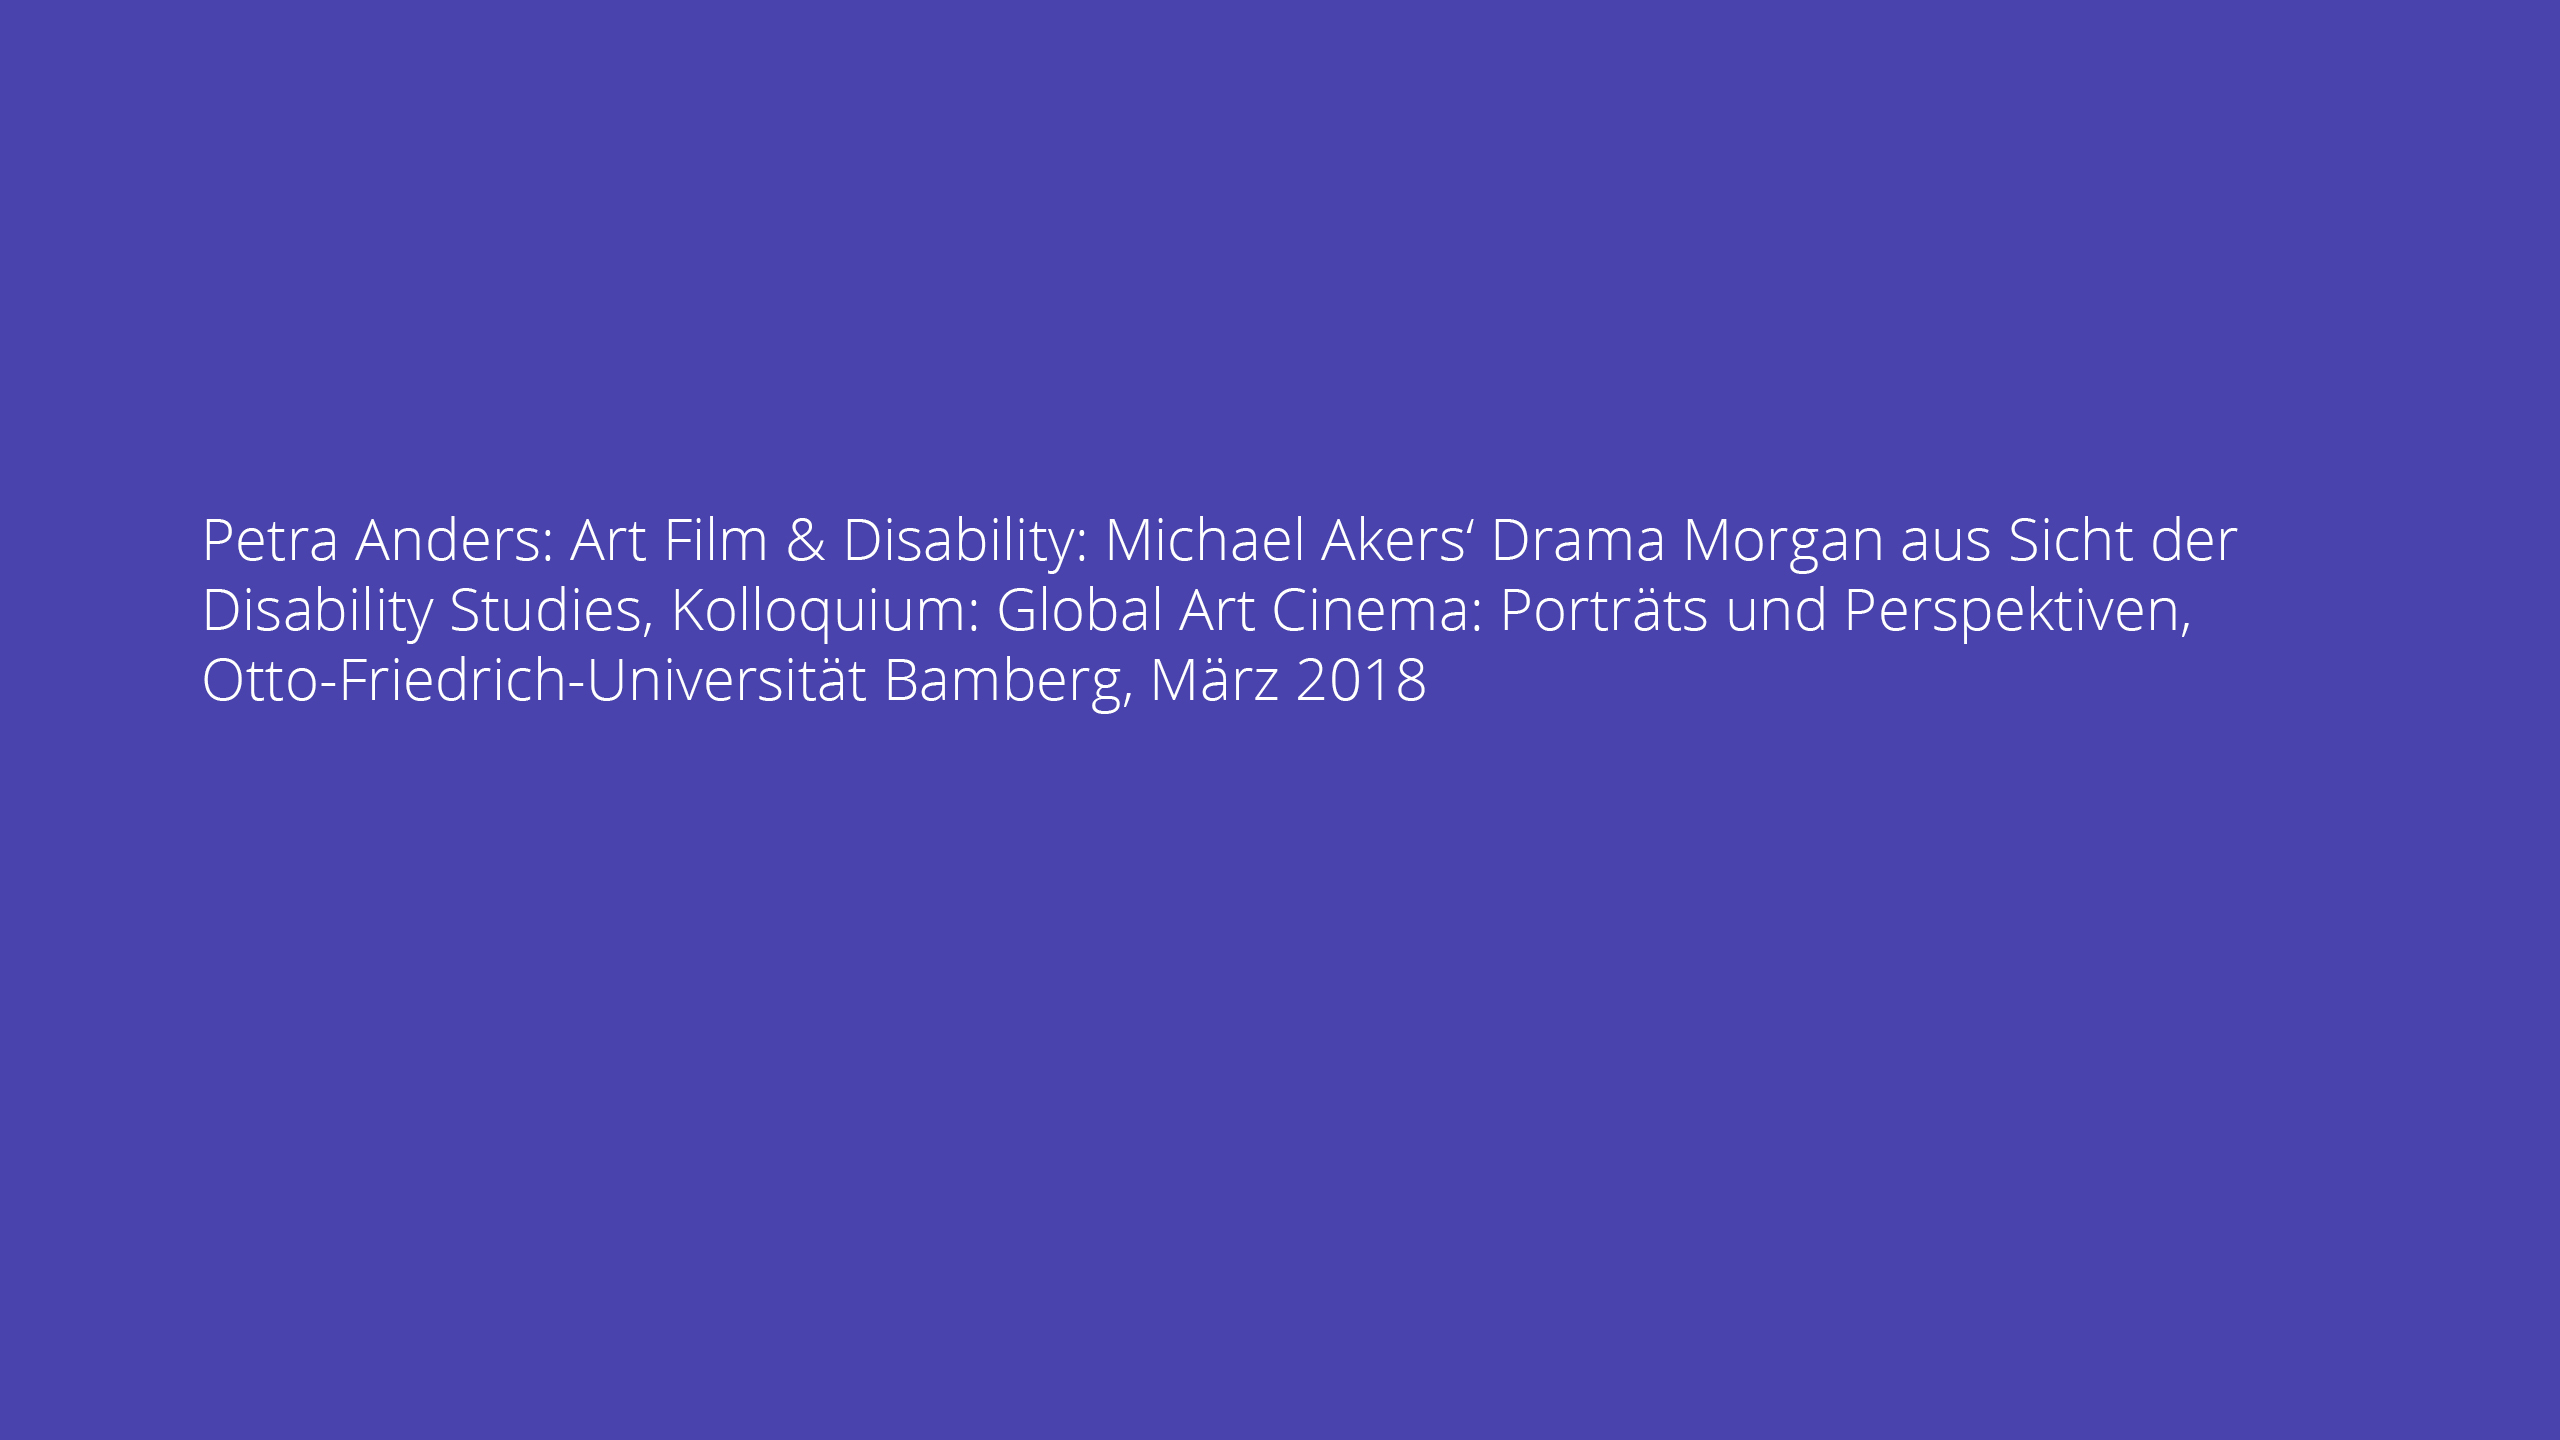 Petra Anders: Art Film & Disability: Michael Akers' Drama Morgan aus Sicht der Disability Studies, Kolloquium: Global Art Cinema: Porträts und Perspektiven, Otto-Friedrich-Universität Bamberg, März 2018